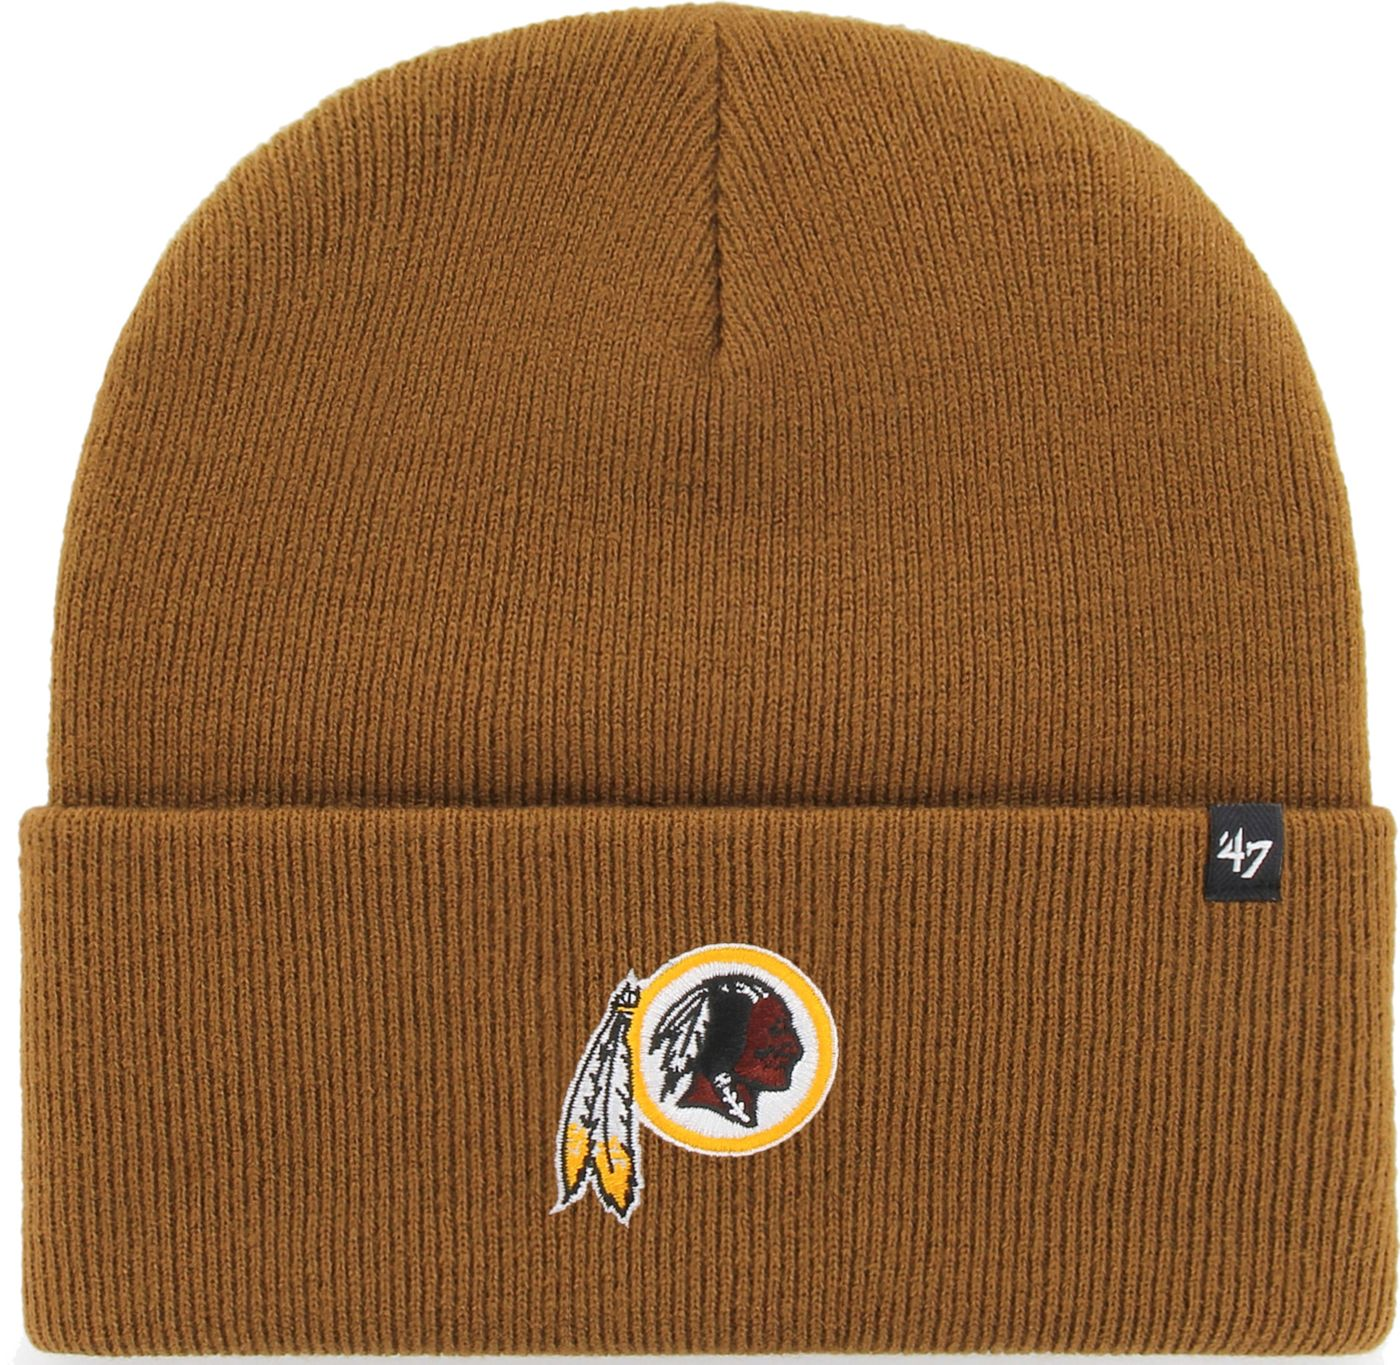 '47 Men's Washington Redskins Carhartt Brown Knit Hat